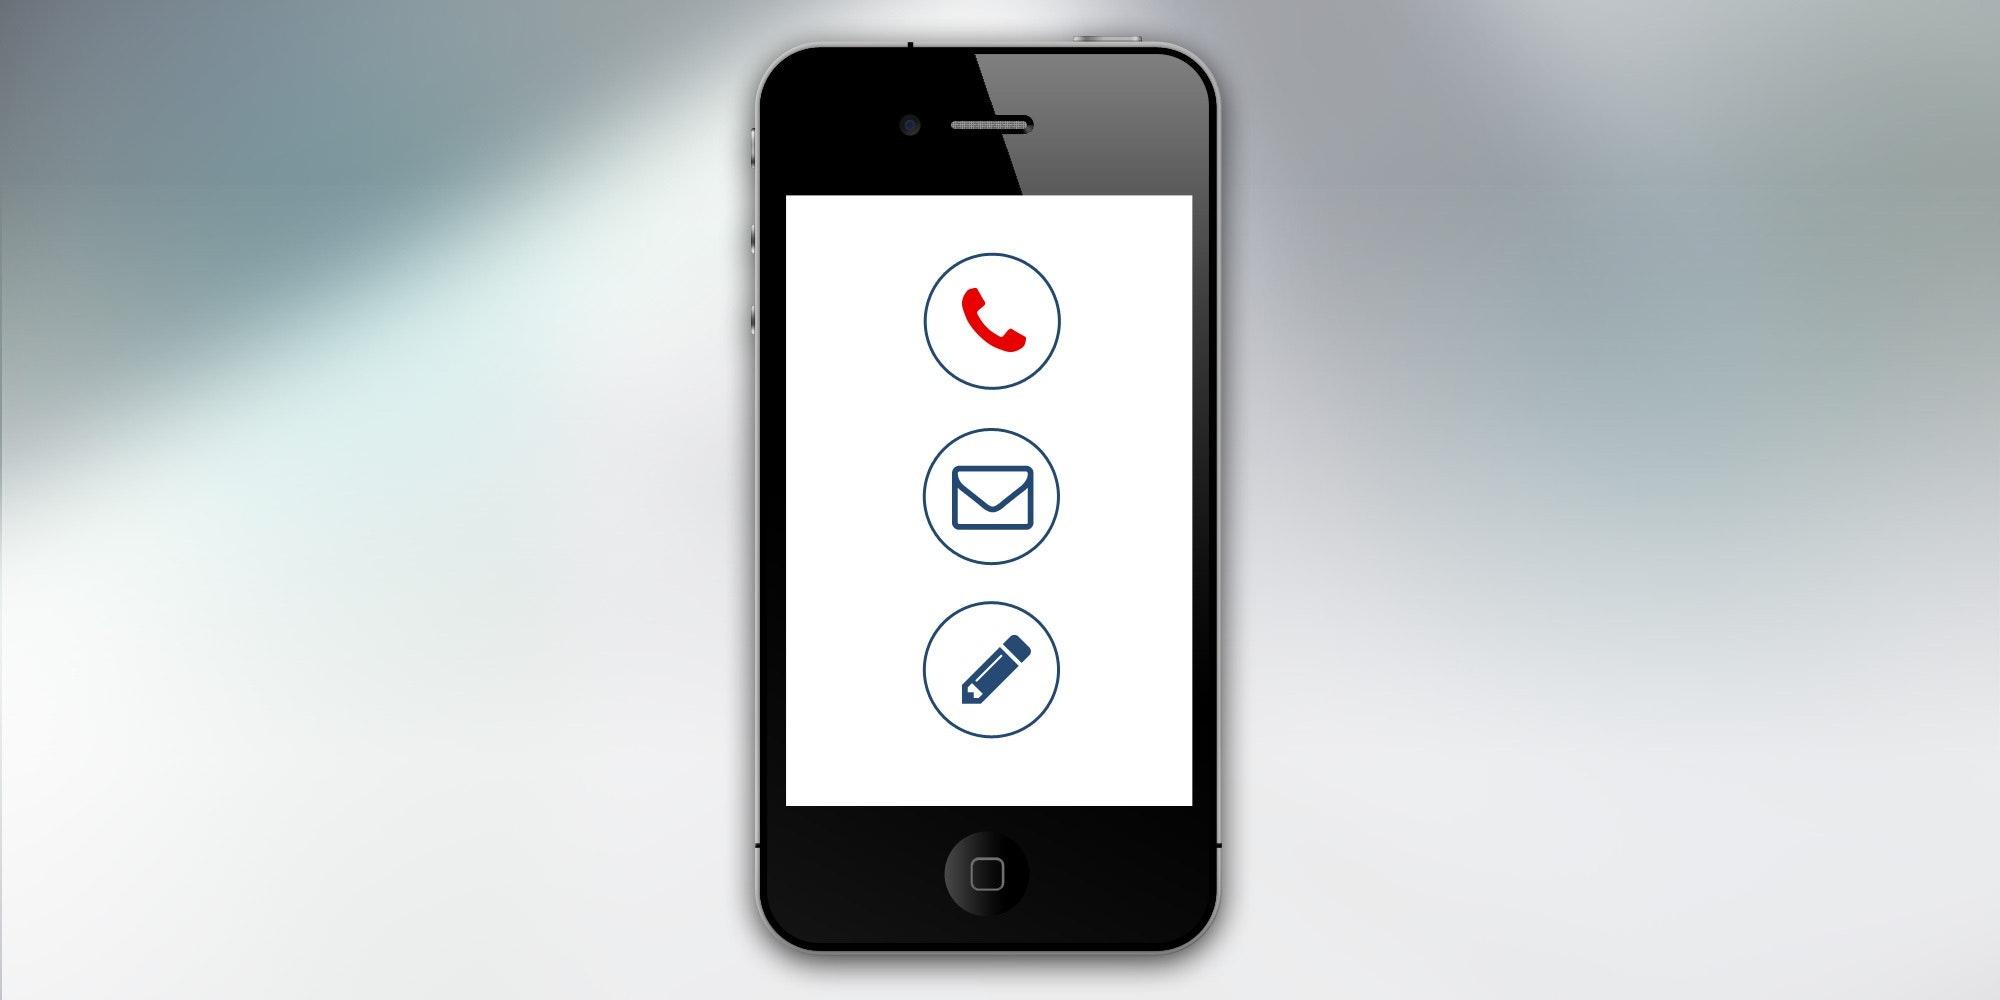 cellphone-cellular-communication-263564.jpg